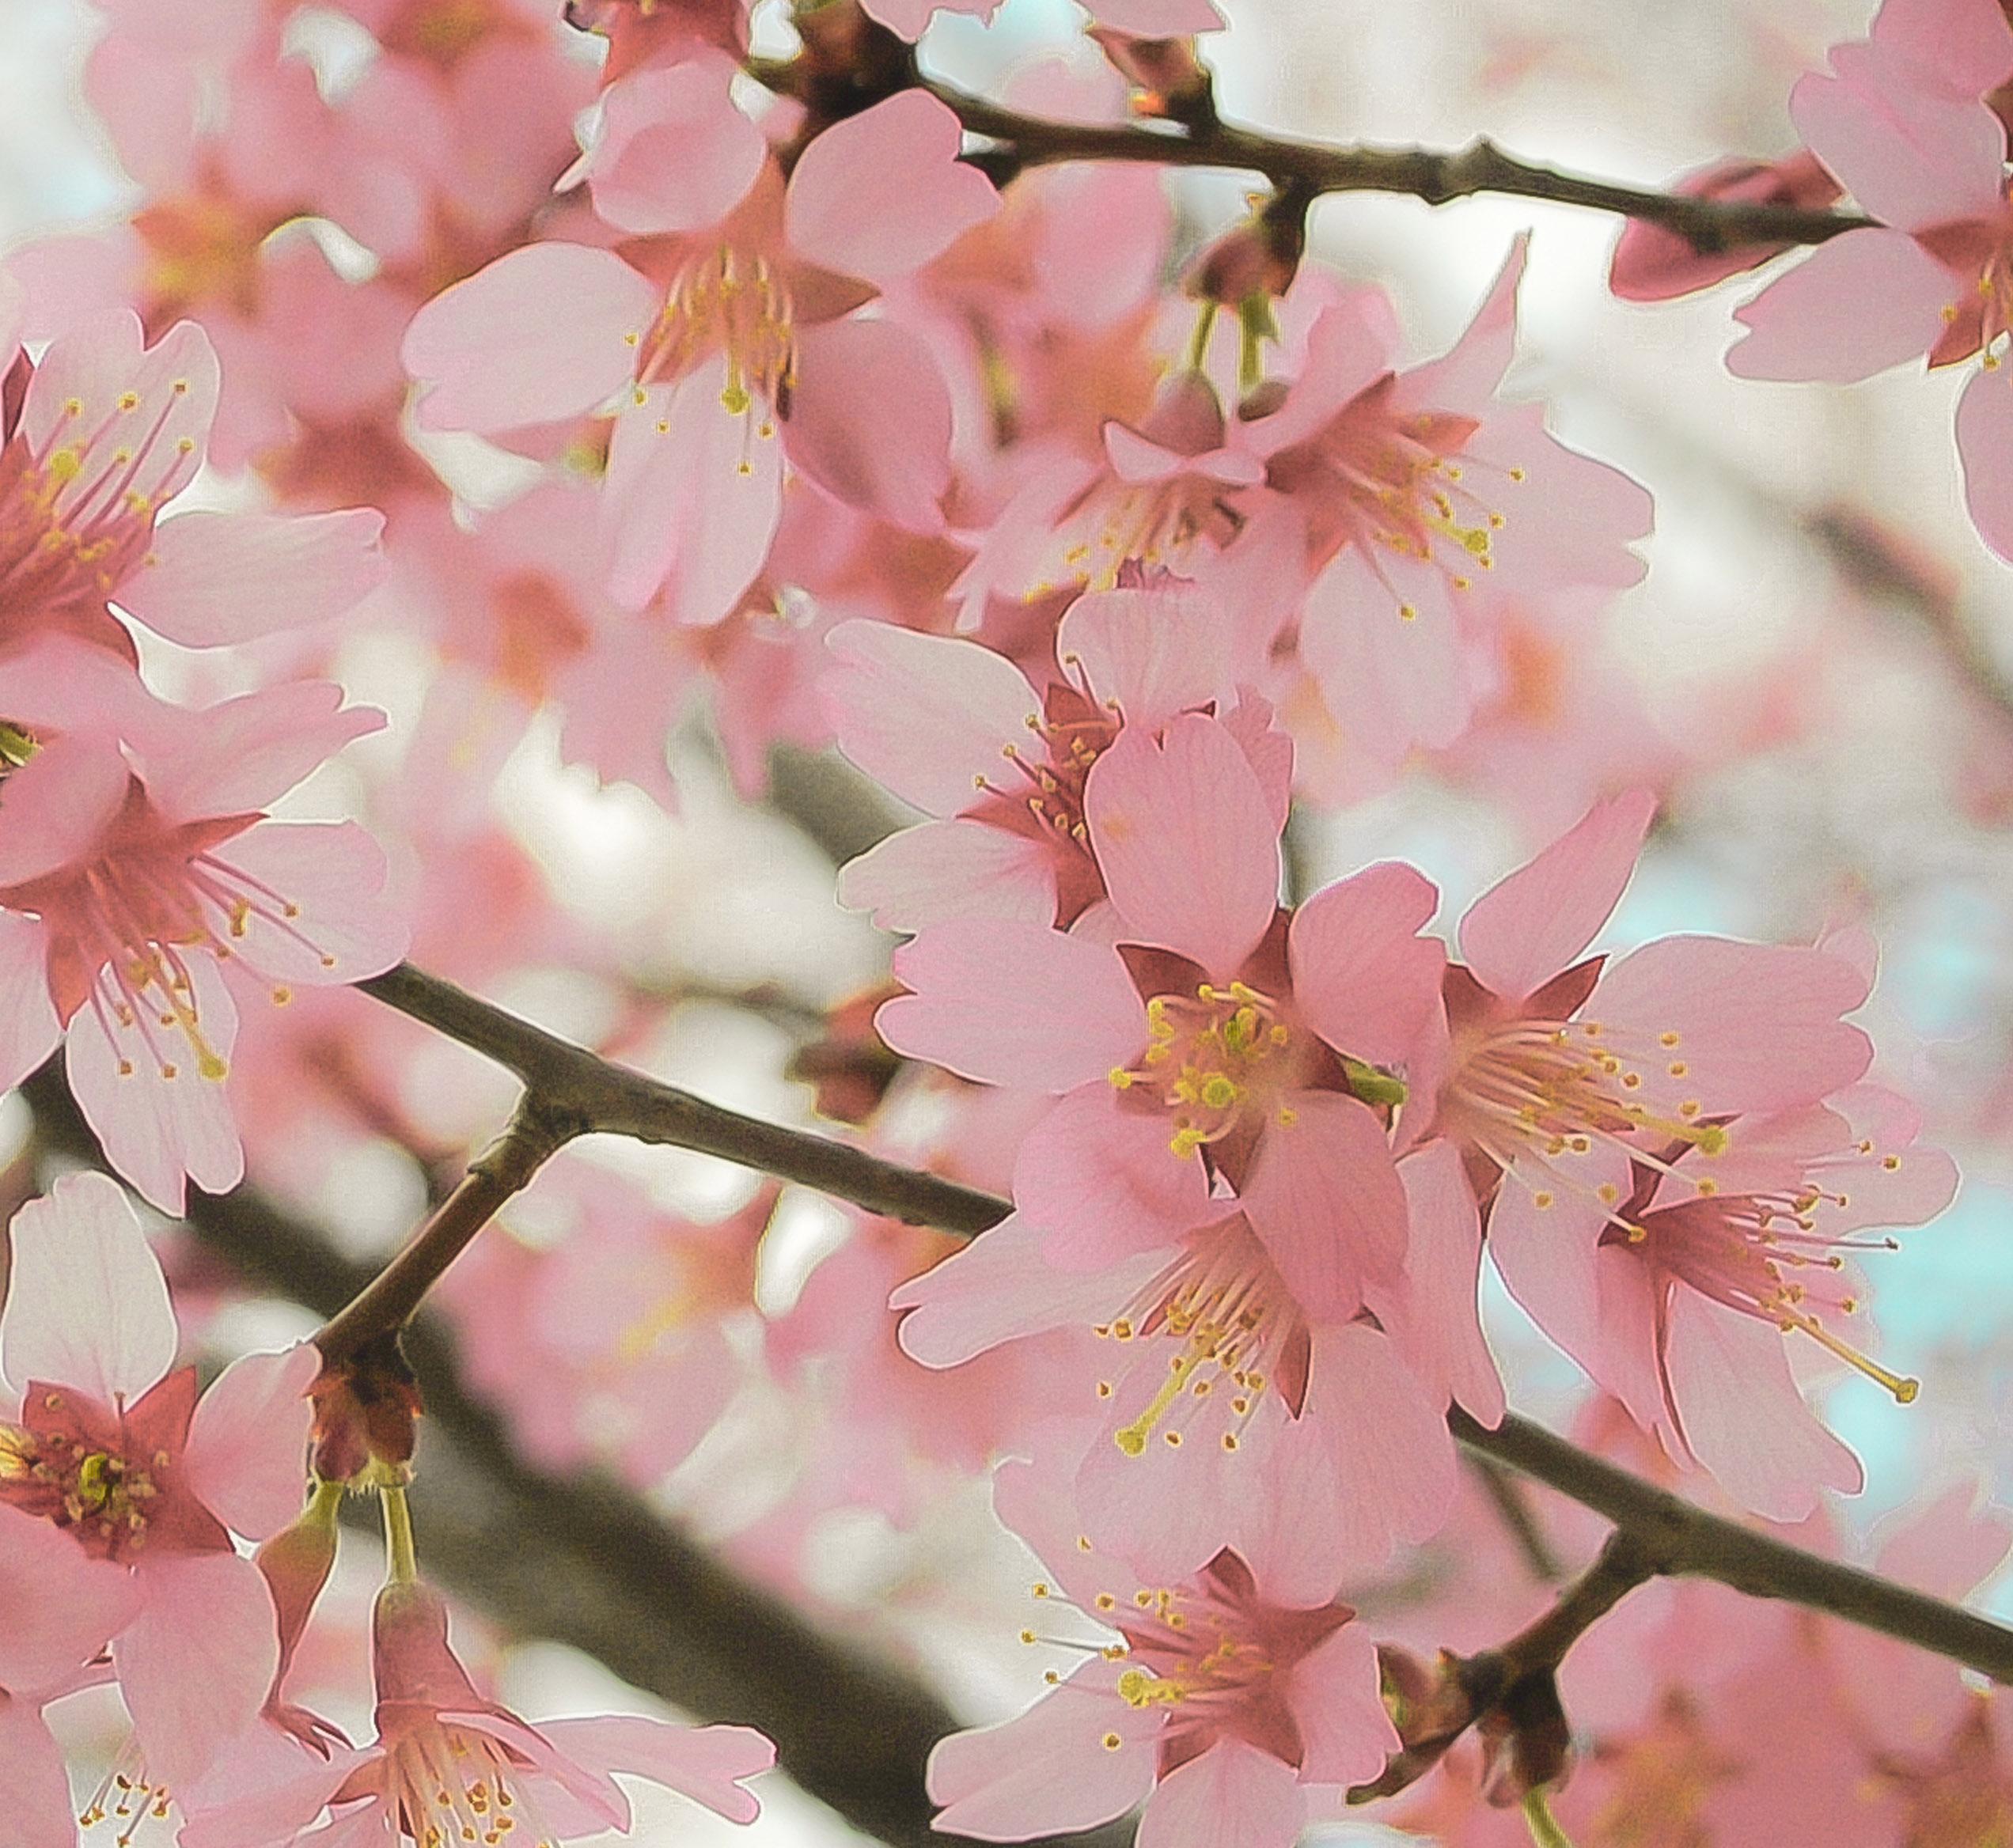 8 X 10 Fine Art Photograph, Cherry Blossom